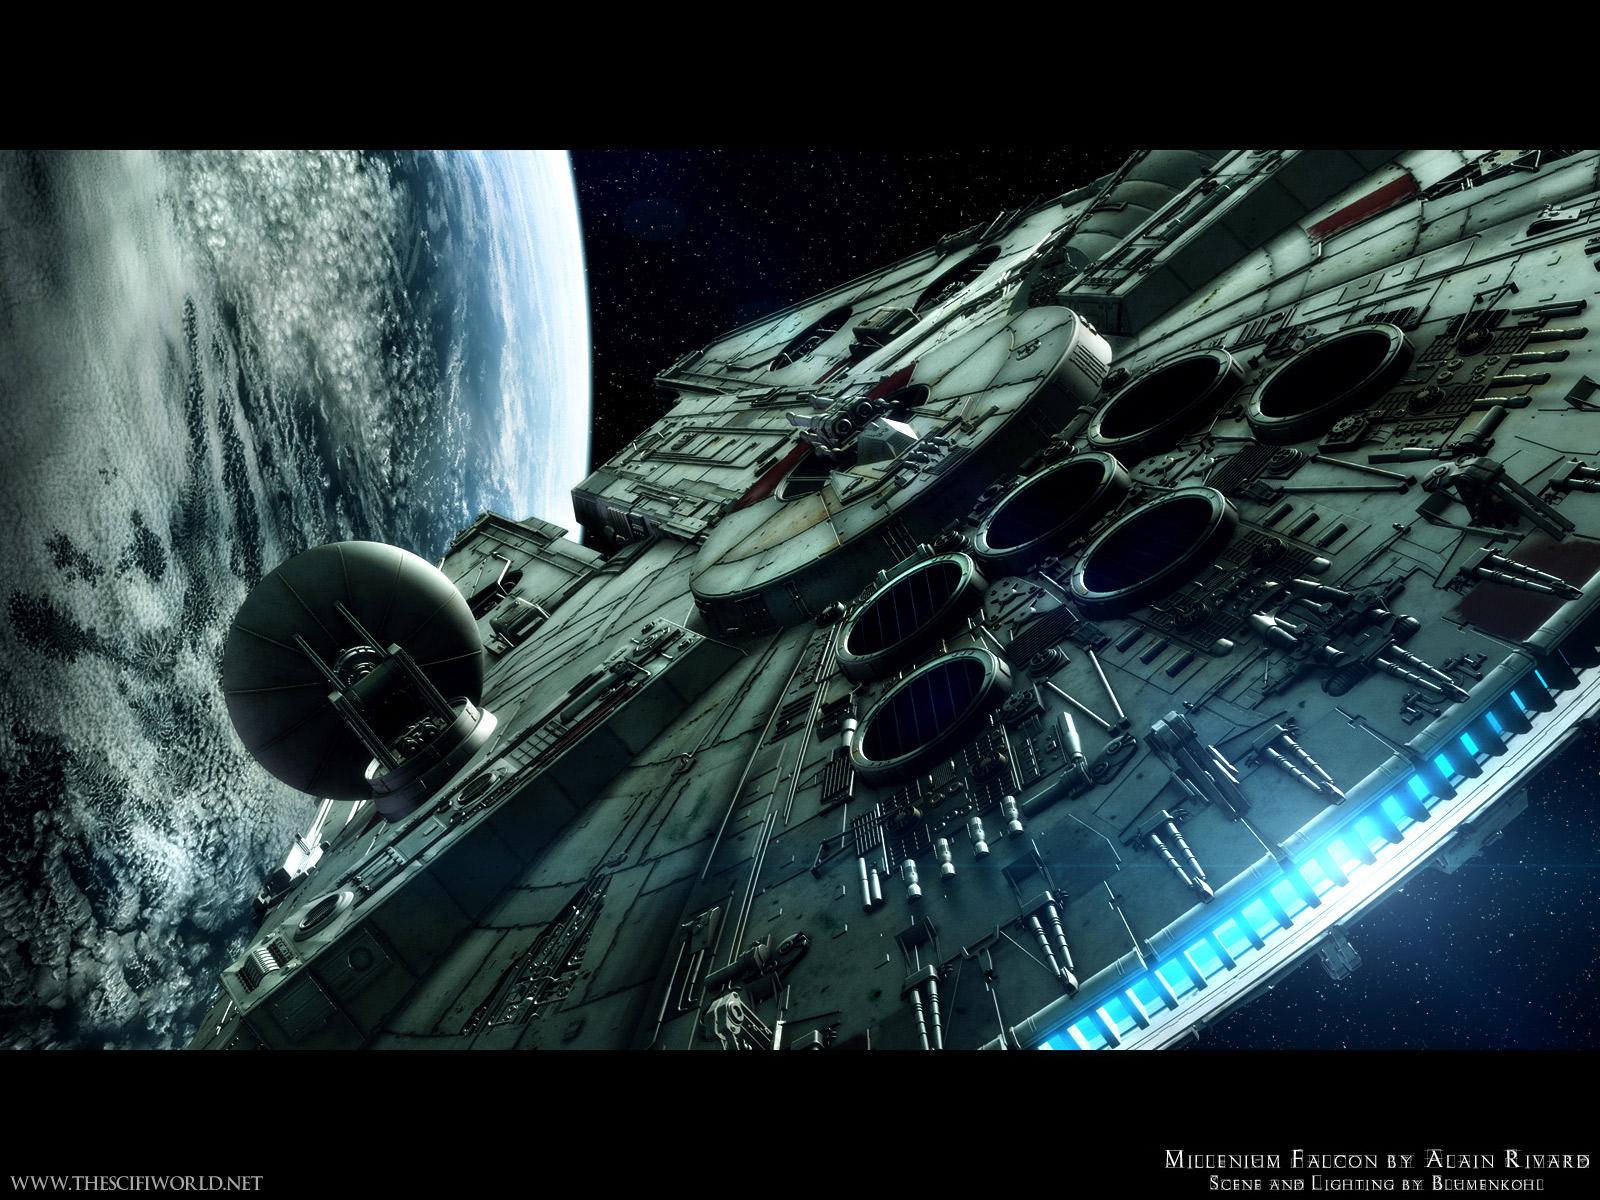 50 Hd Star Wars Wallpapers On Wallpapersafari